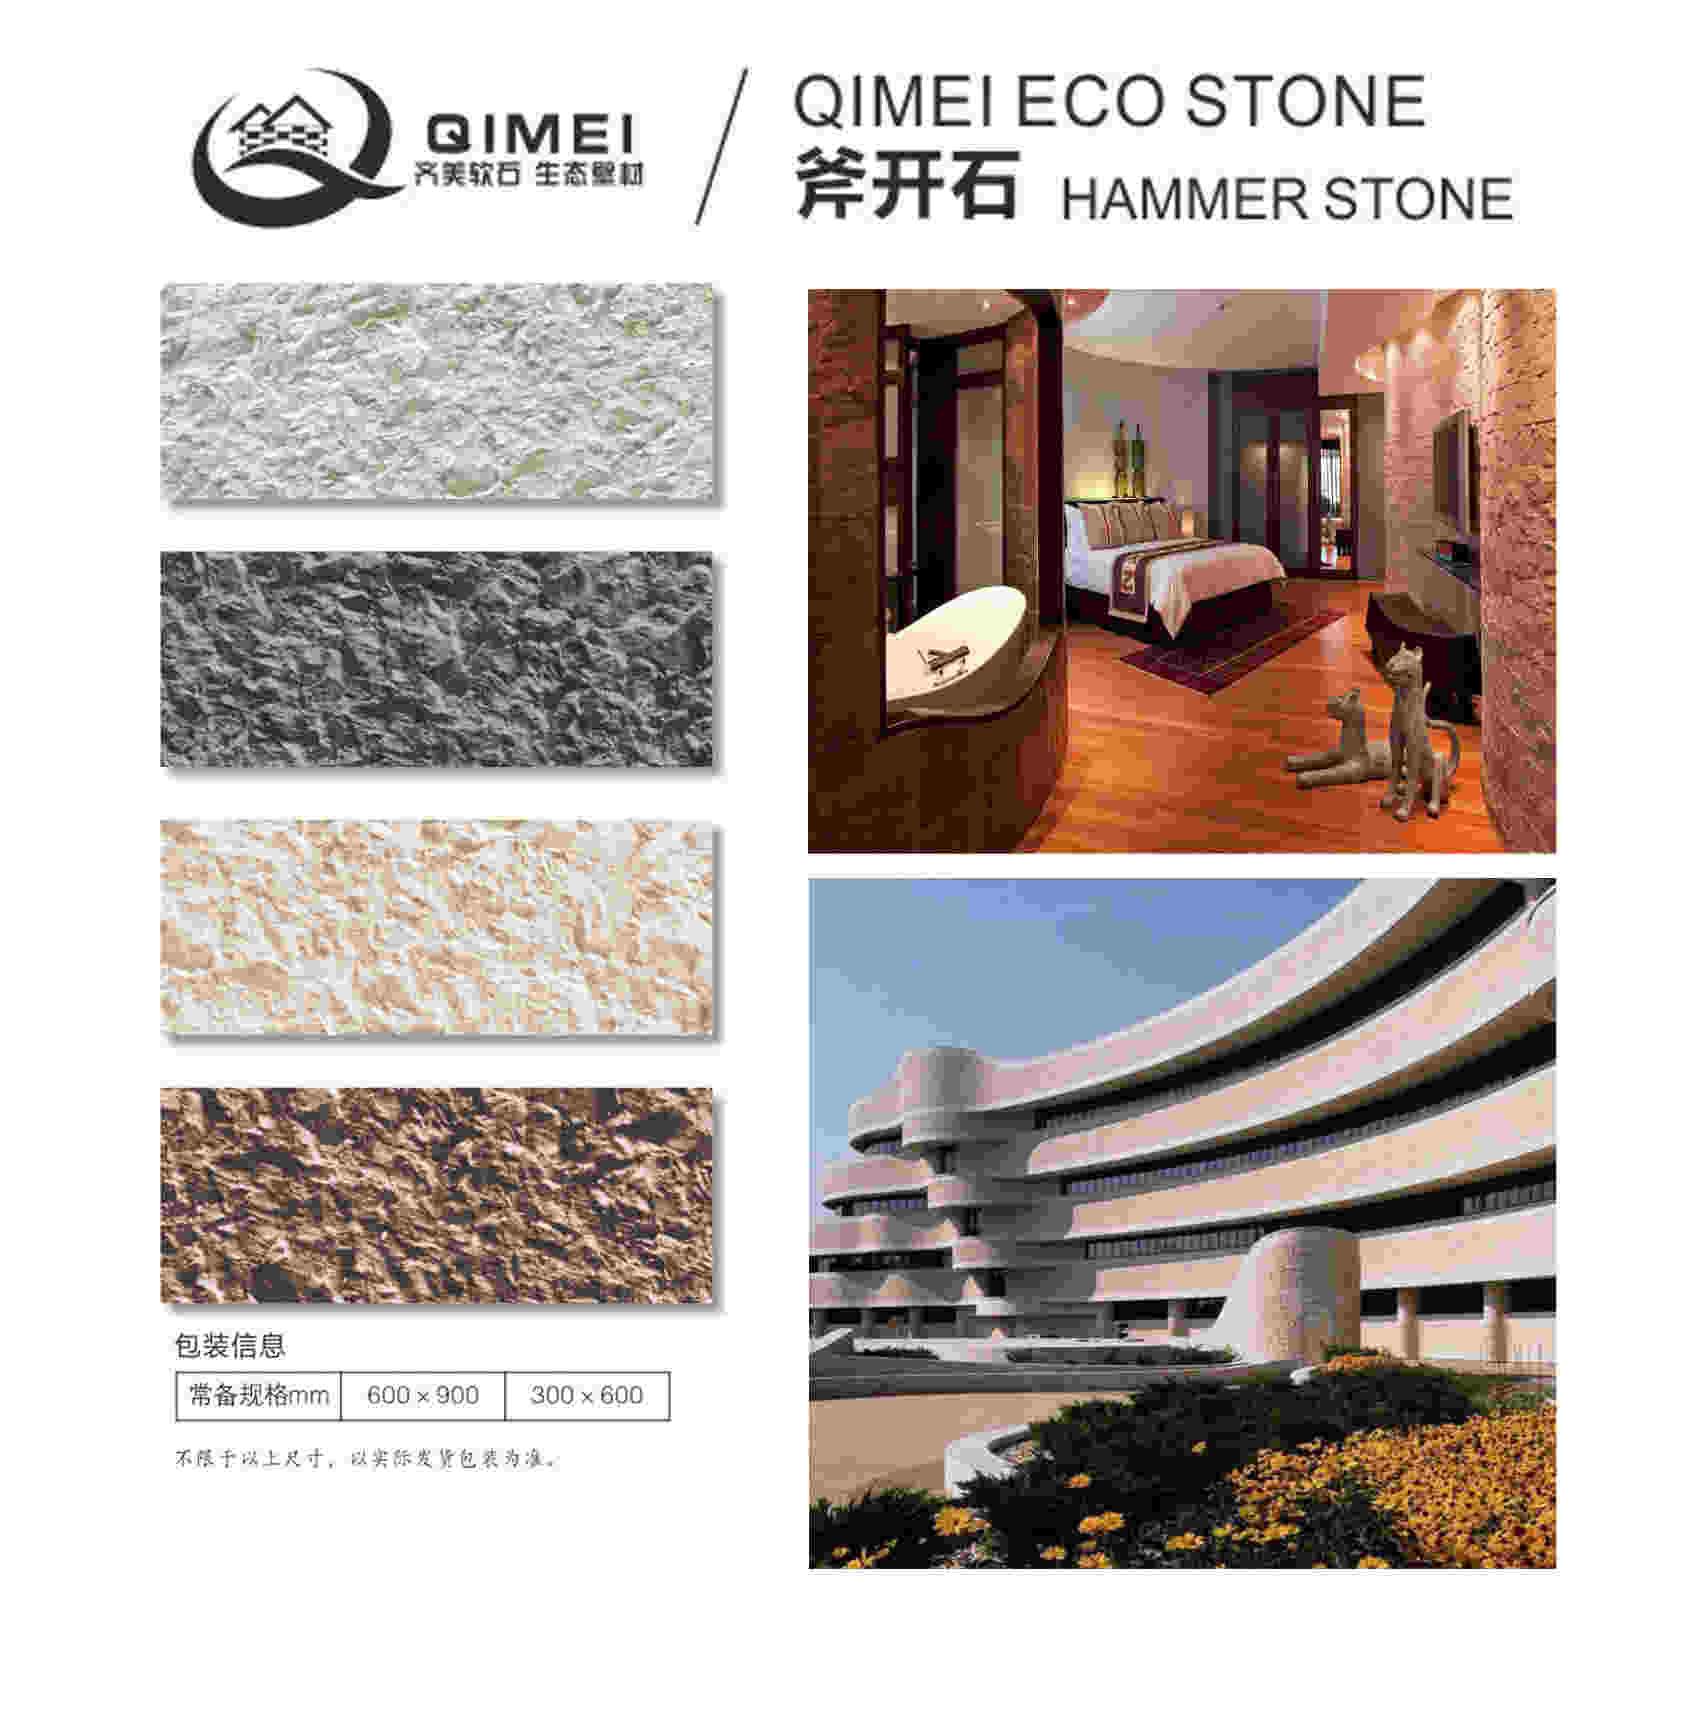 CHINA Jiangsu baidai light weight and safety stone/artificial natural stone pattern/texture